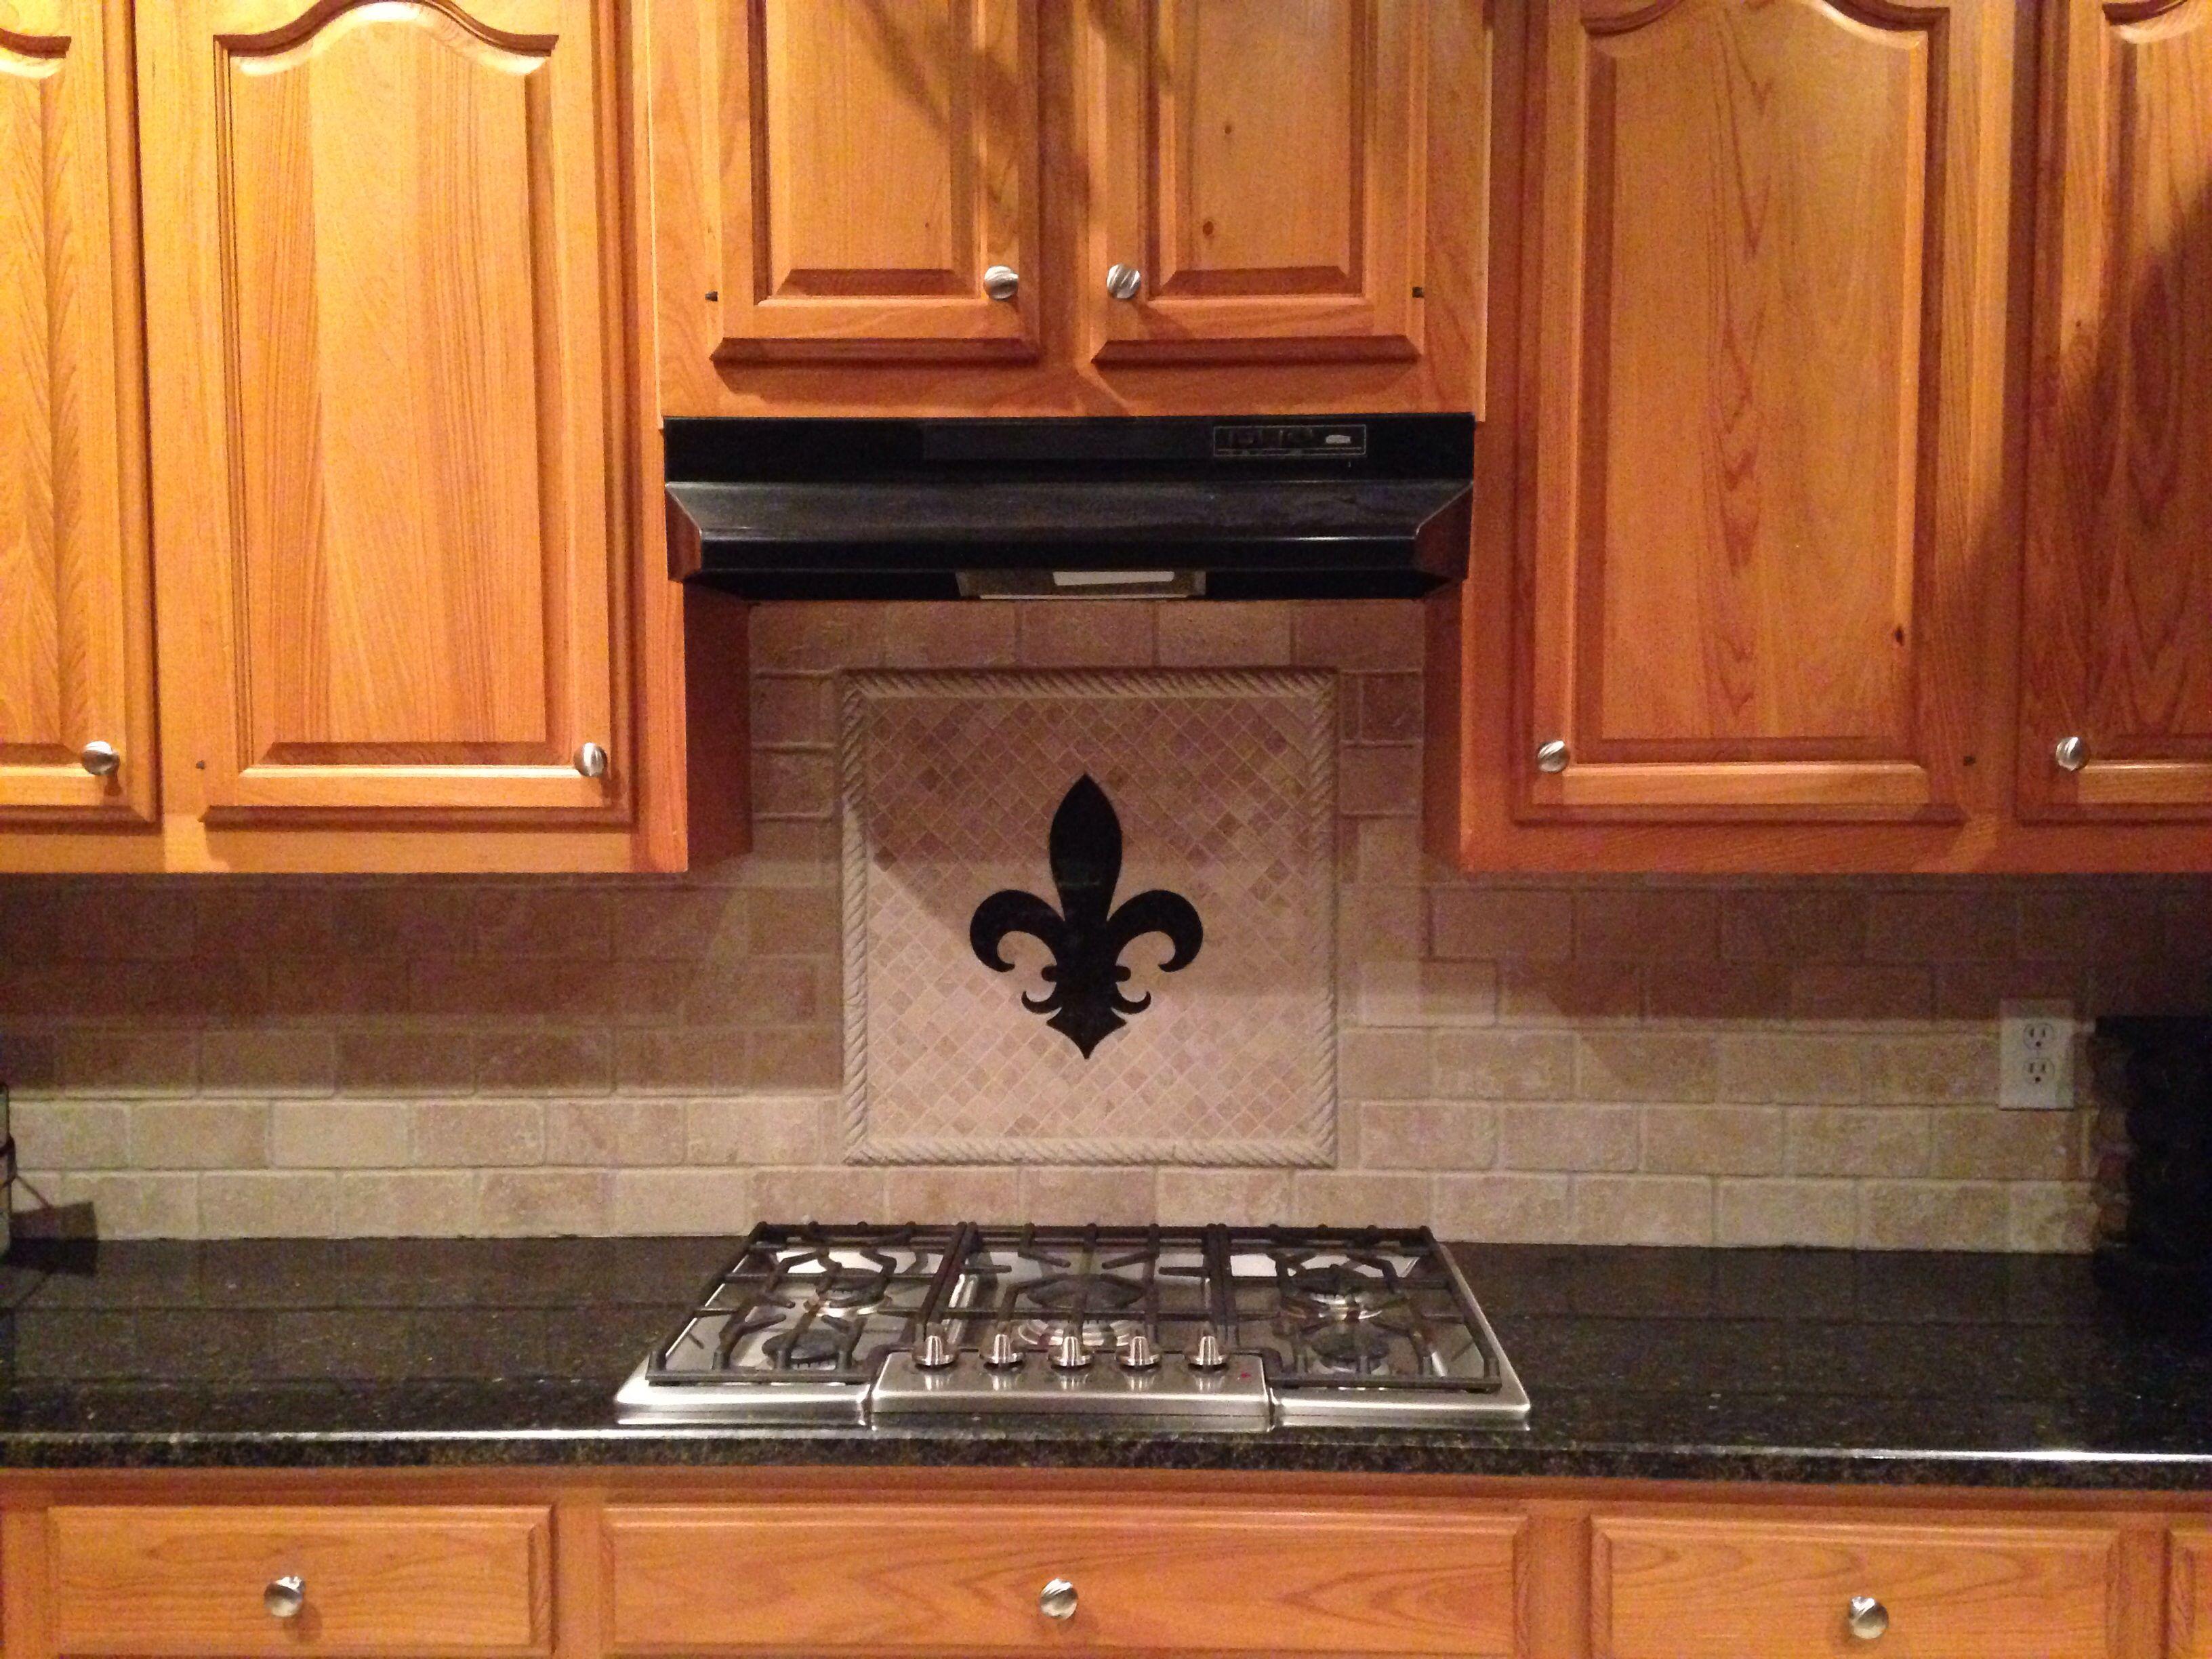 Fleur de lis backsplash tiles - Travertine Backsplash Fleur De Lis Matches Granite Countertop